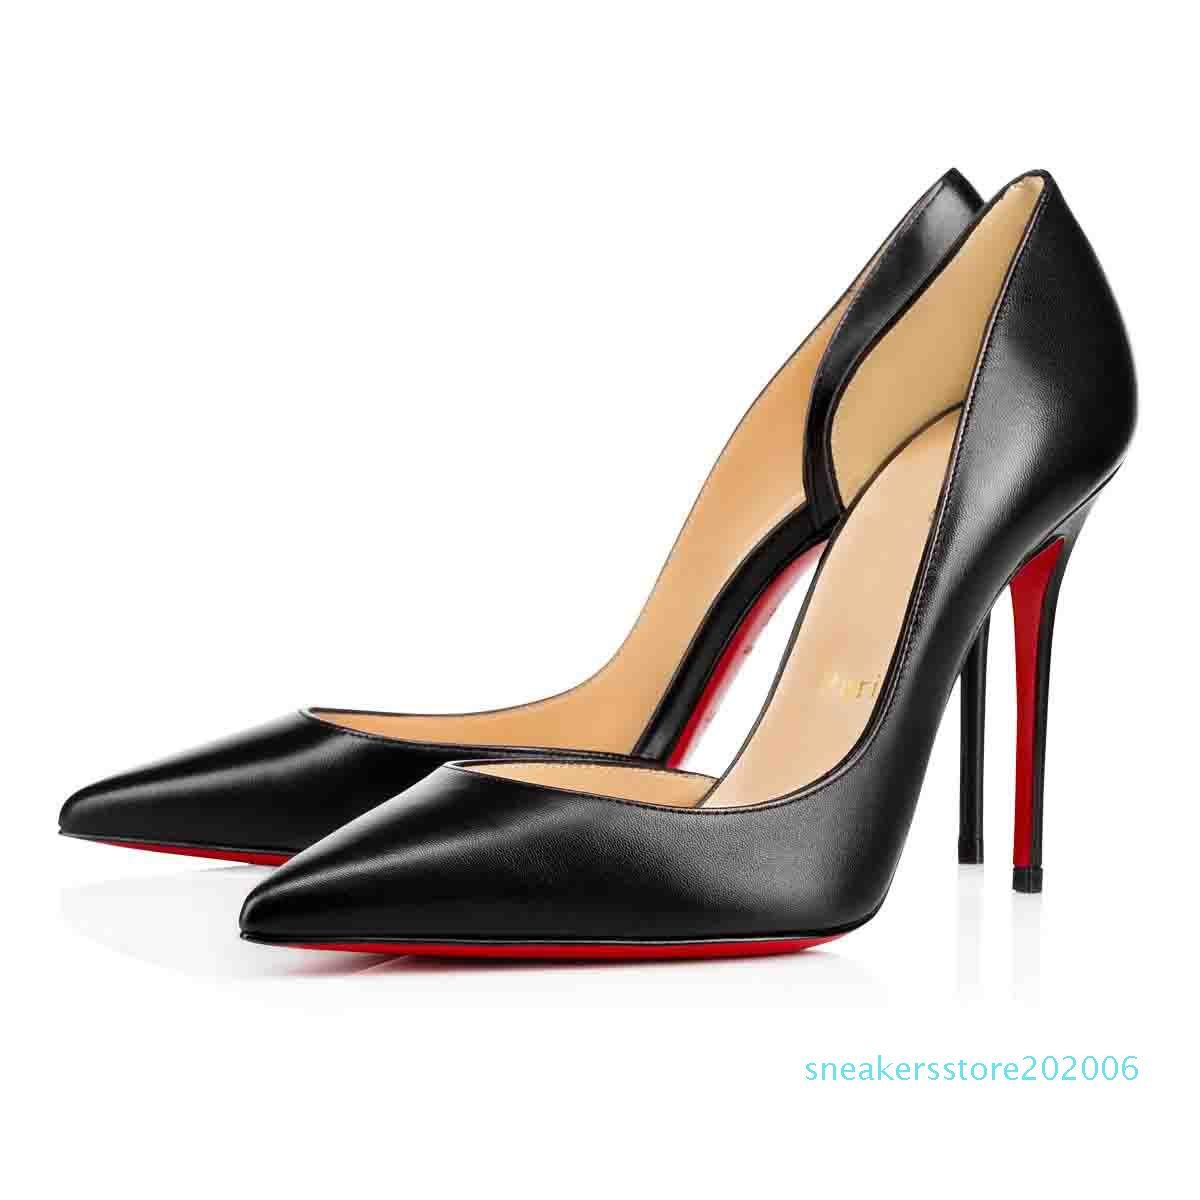 Couro preto Nude Glitter Mulheres Red inferior Iriza Shoes, Itália Luxo Homens Red Soles Salto Alto Party Dress Flats livre-Side / Salto s06